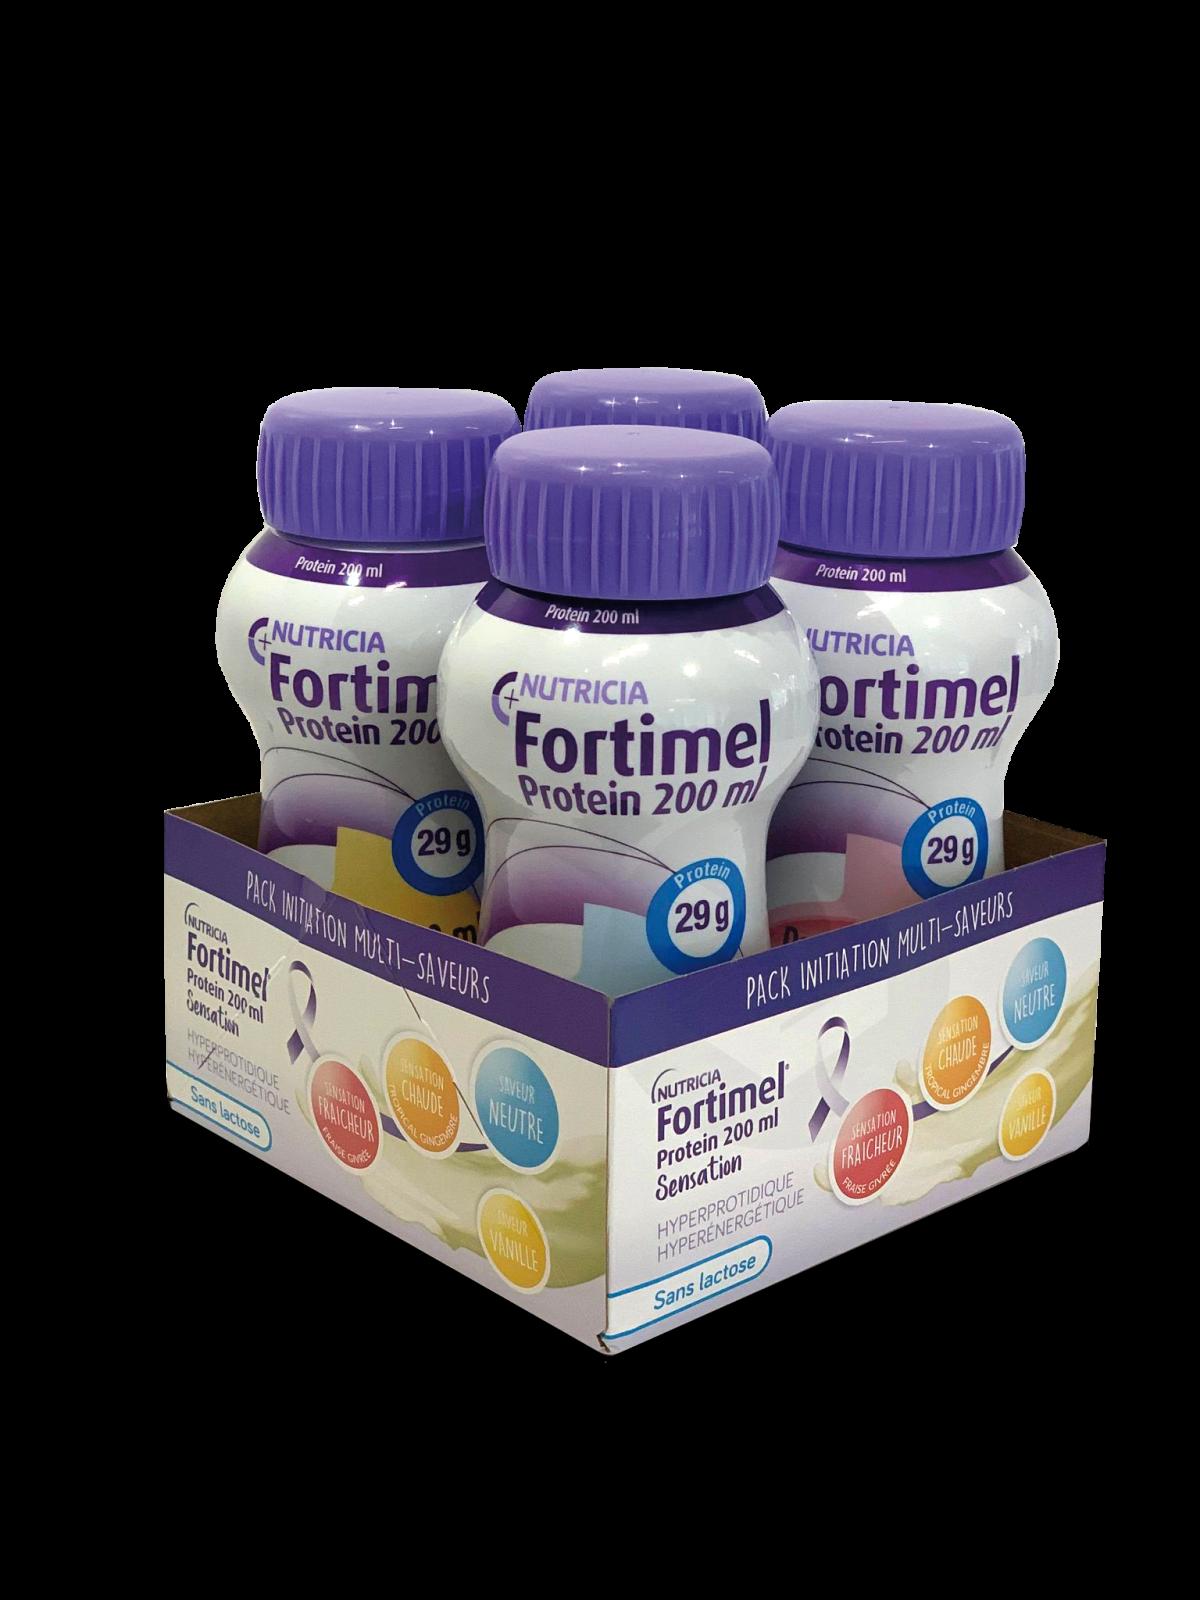 Fortimel Protein Sensation Pack Multi-saveurs 200 ml